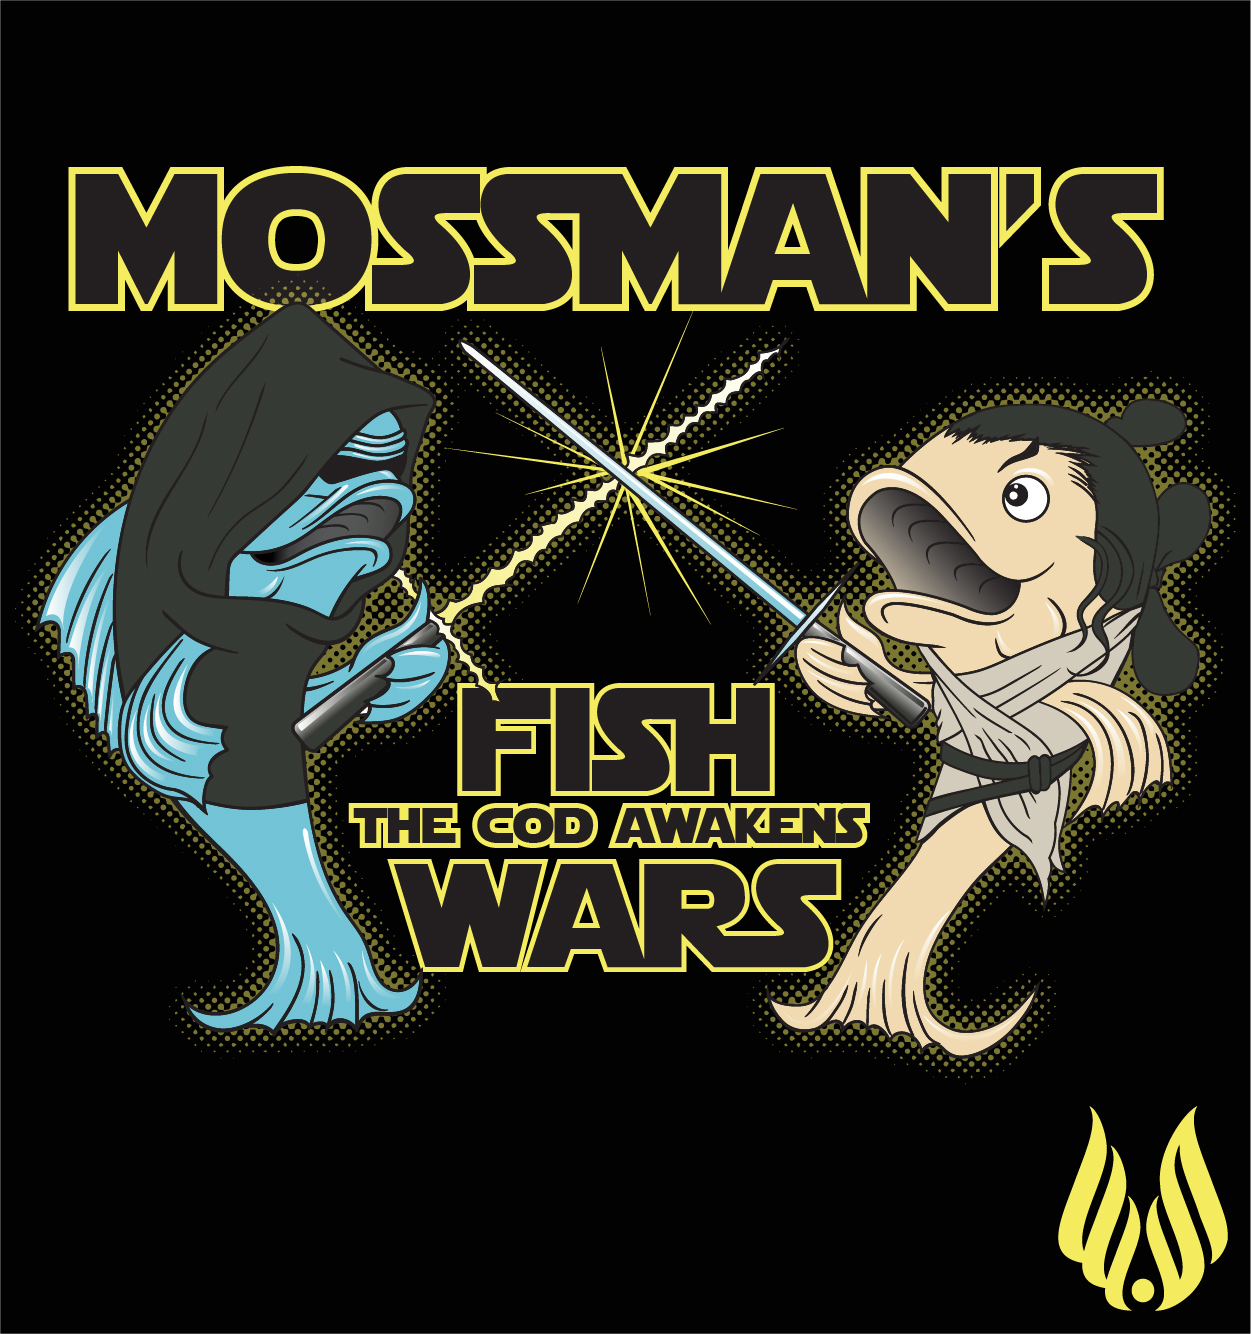 Mossman's